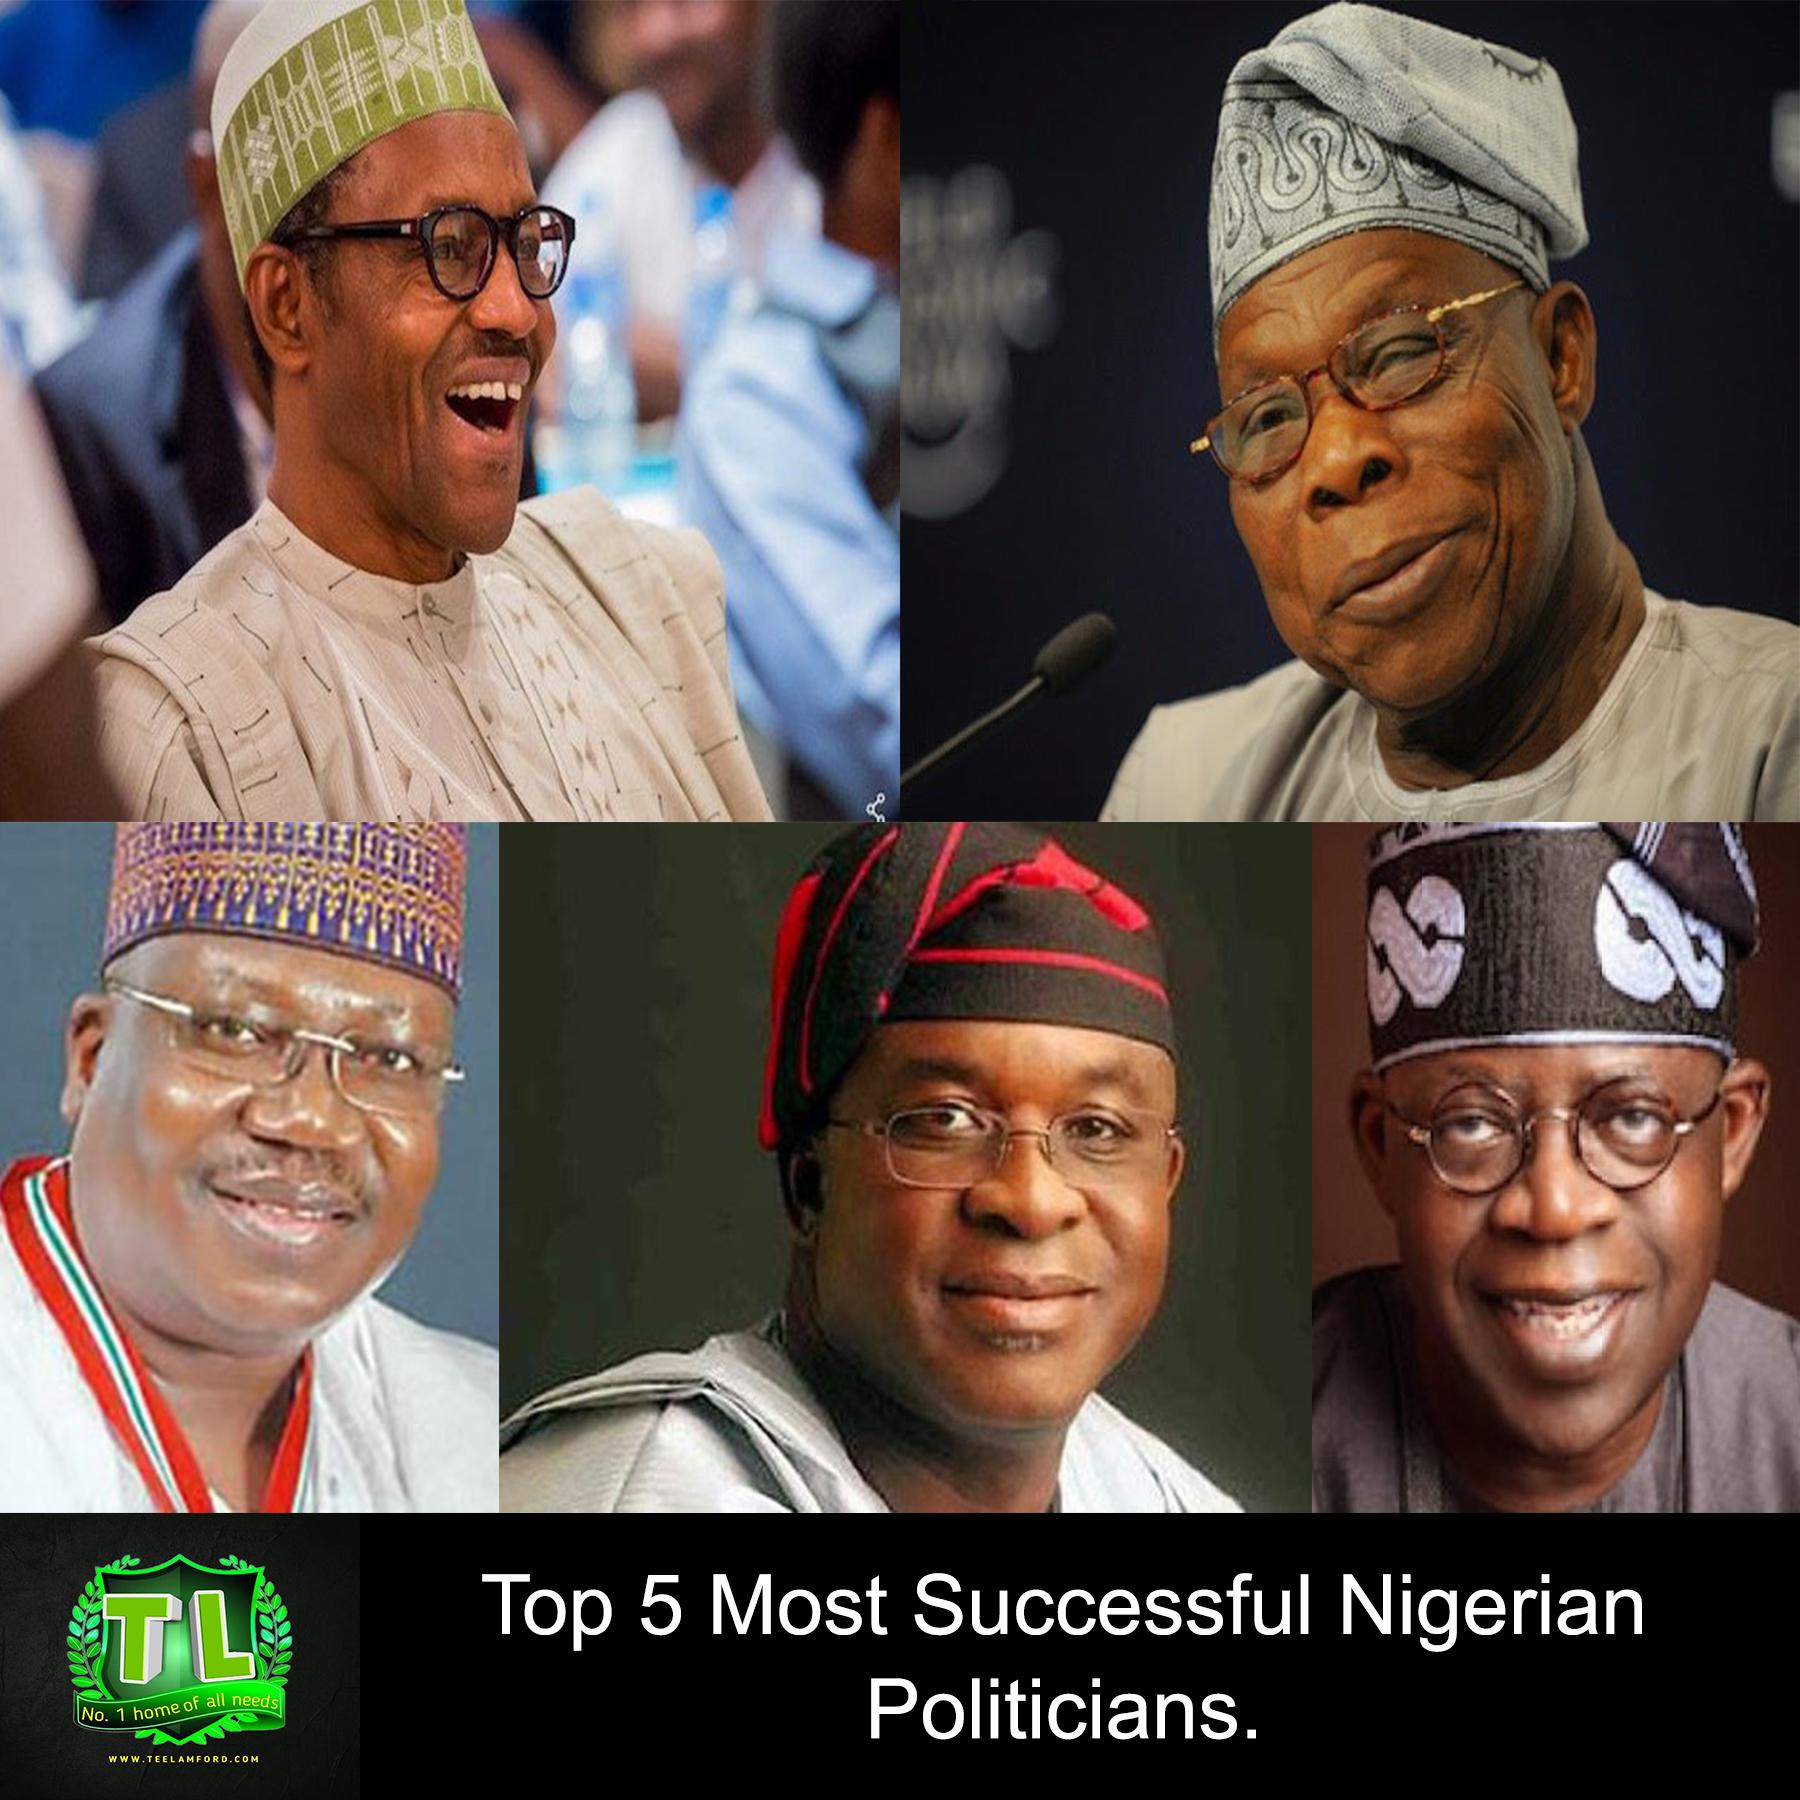 Top-5-Most-Successful-Nigerian-Politicians-Teelamford